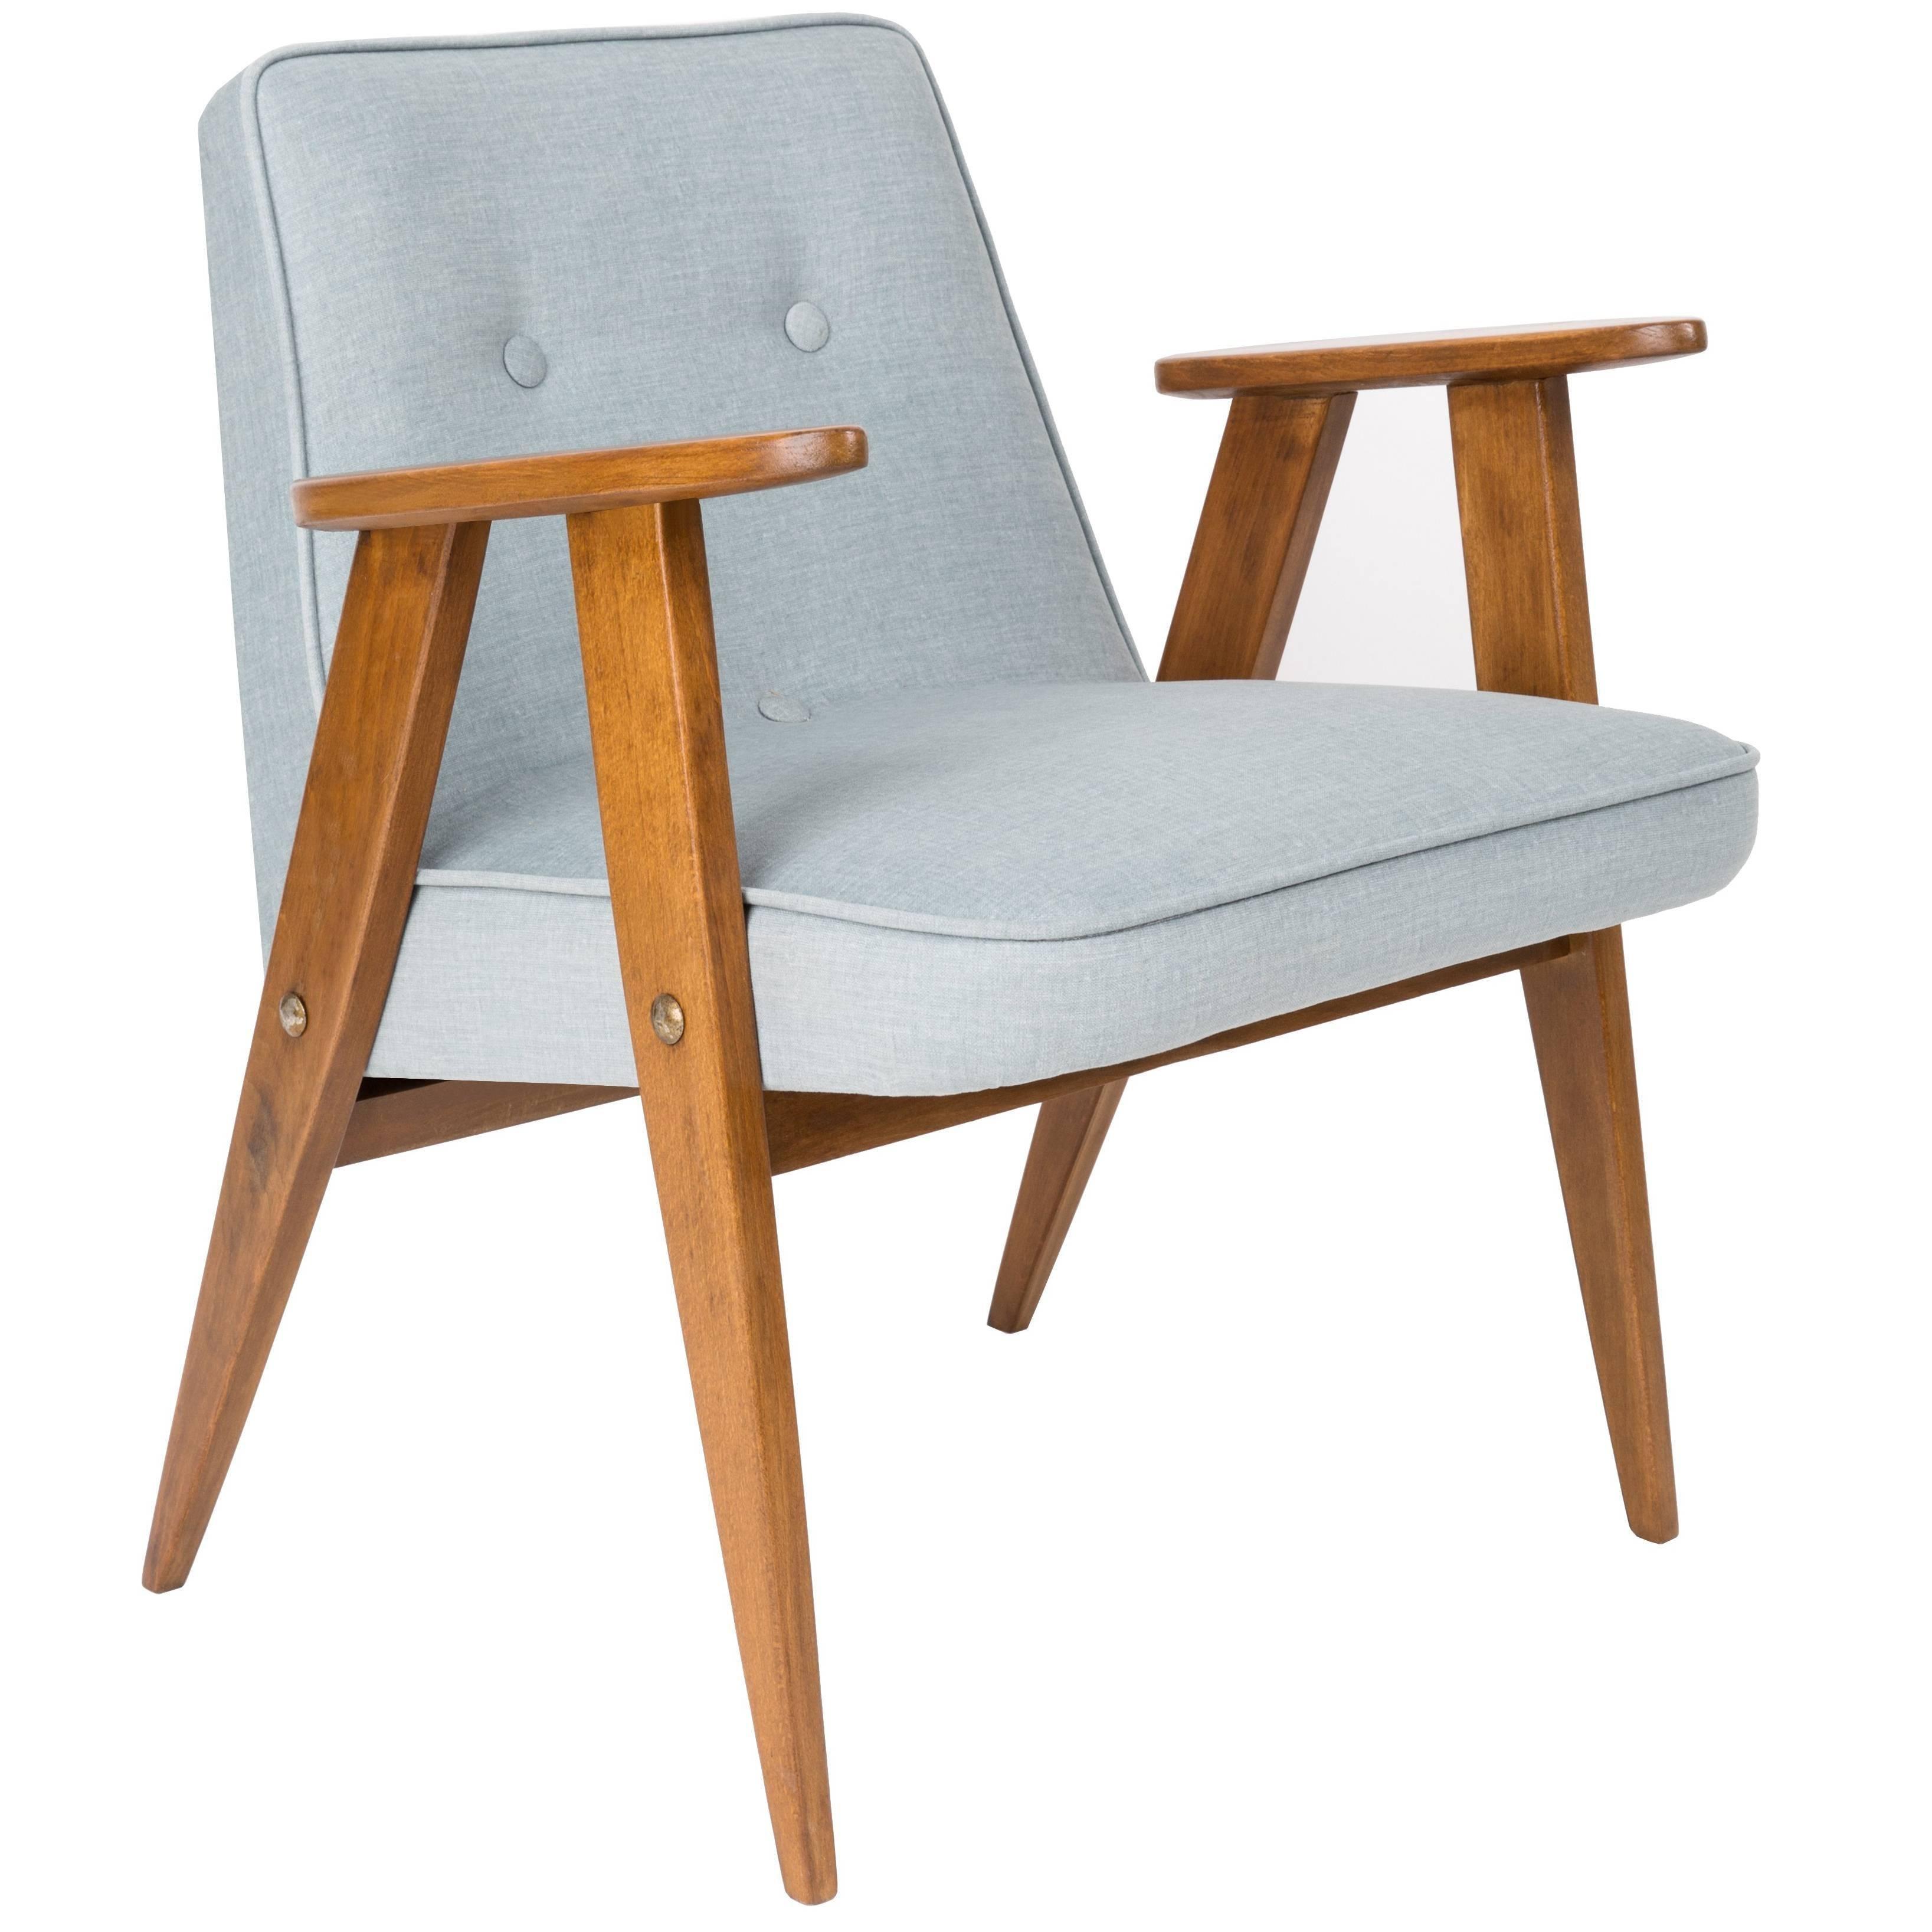 Two Marcel Breuer D4 B4 Folding Chairs, Wassily Bauhaus, 1926 1927